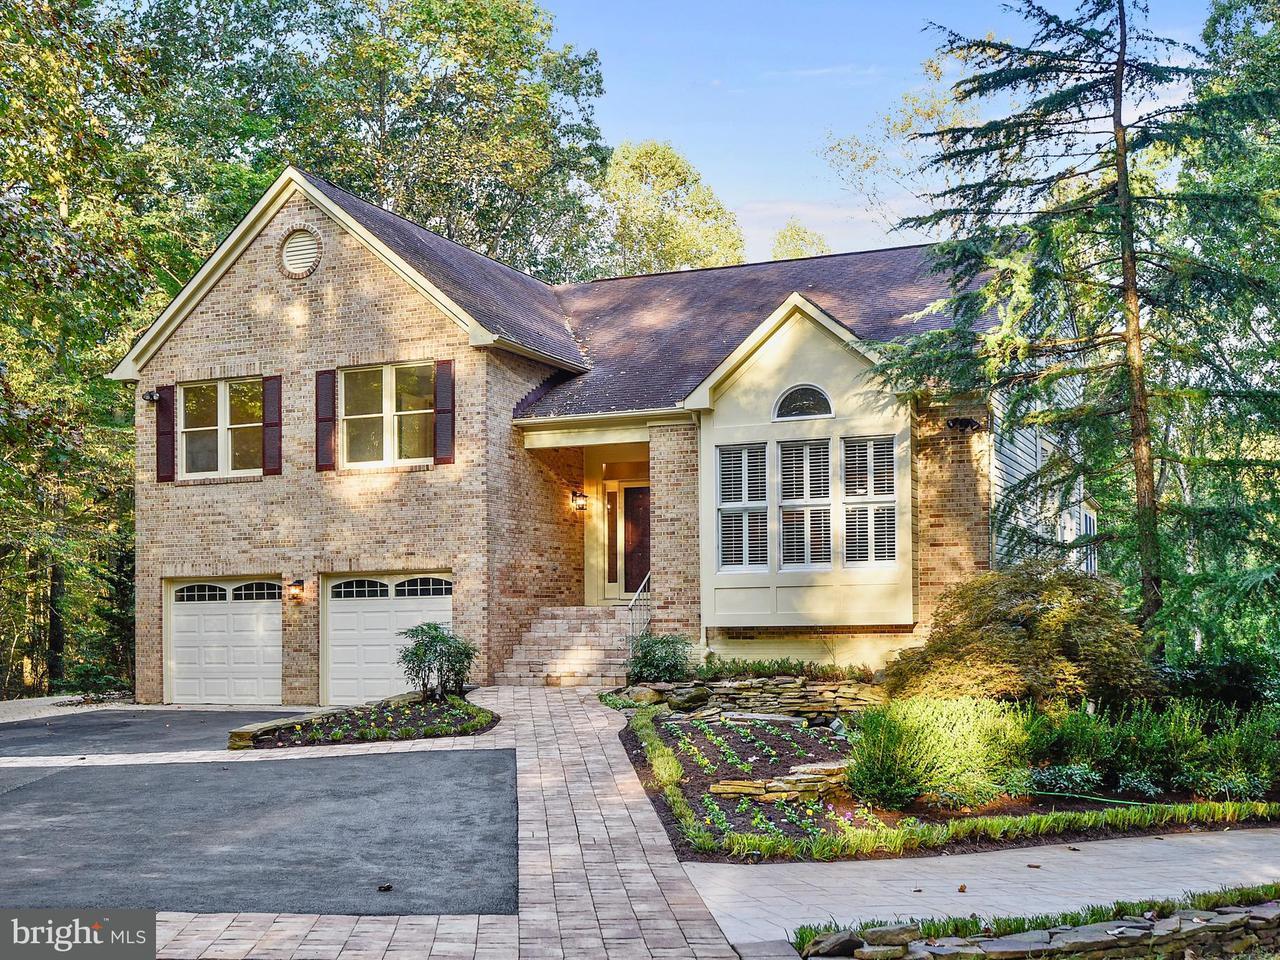 Single Family Home for Sale at 3104 ARROWHEAD FARMS Road 3104 ARROWHEAD FARMS Road Gambrills, Maryland 21054 United States